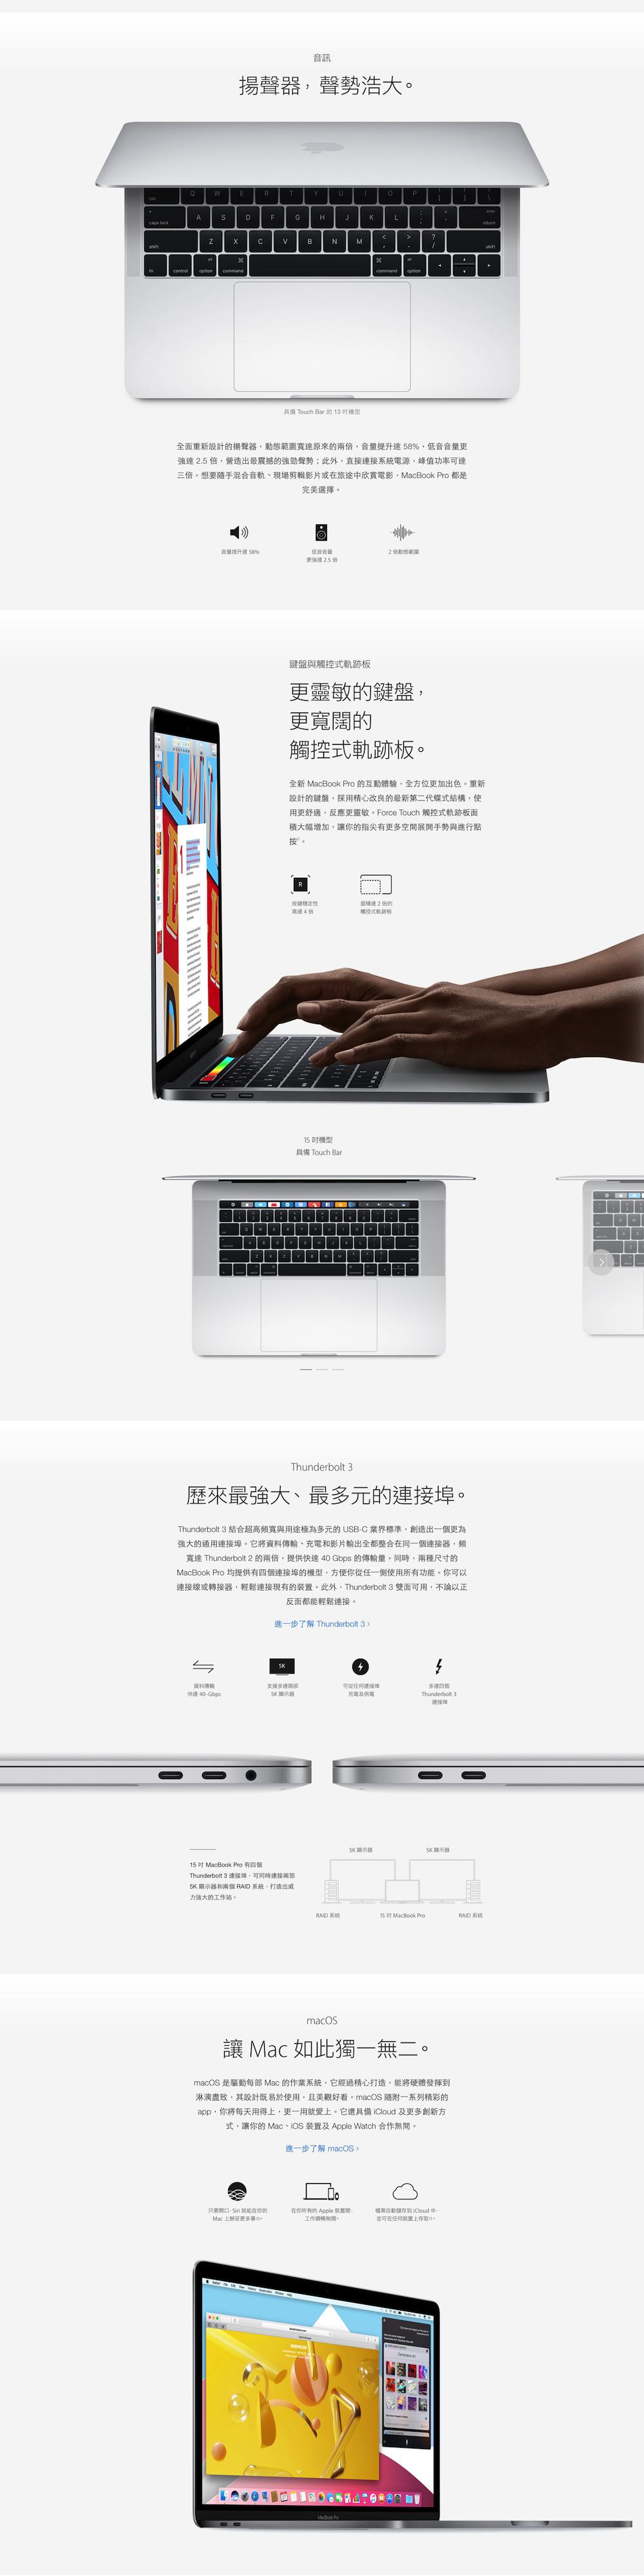 2017 新款訂製 MacBook Pro 13吋 2.3G 特規16G 特規512G SSD 實體門市 台灣貨中文鍵盤 很好用